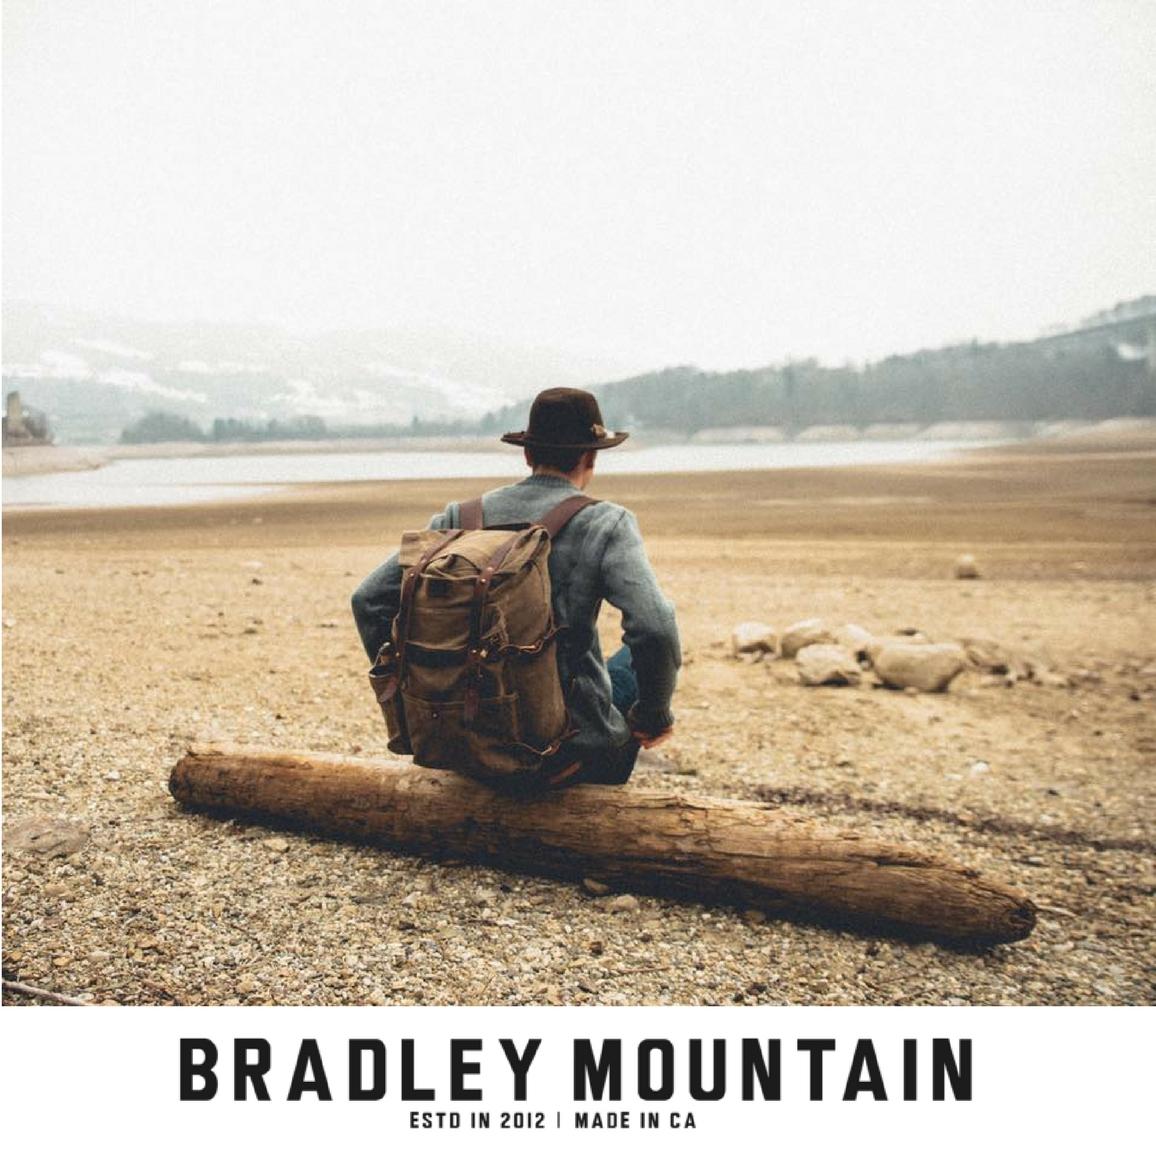 Bradley Mountain Brand image.jpg